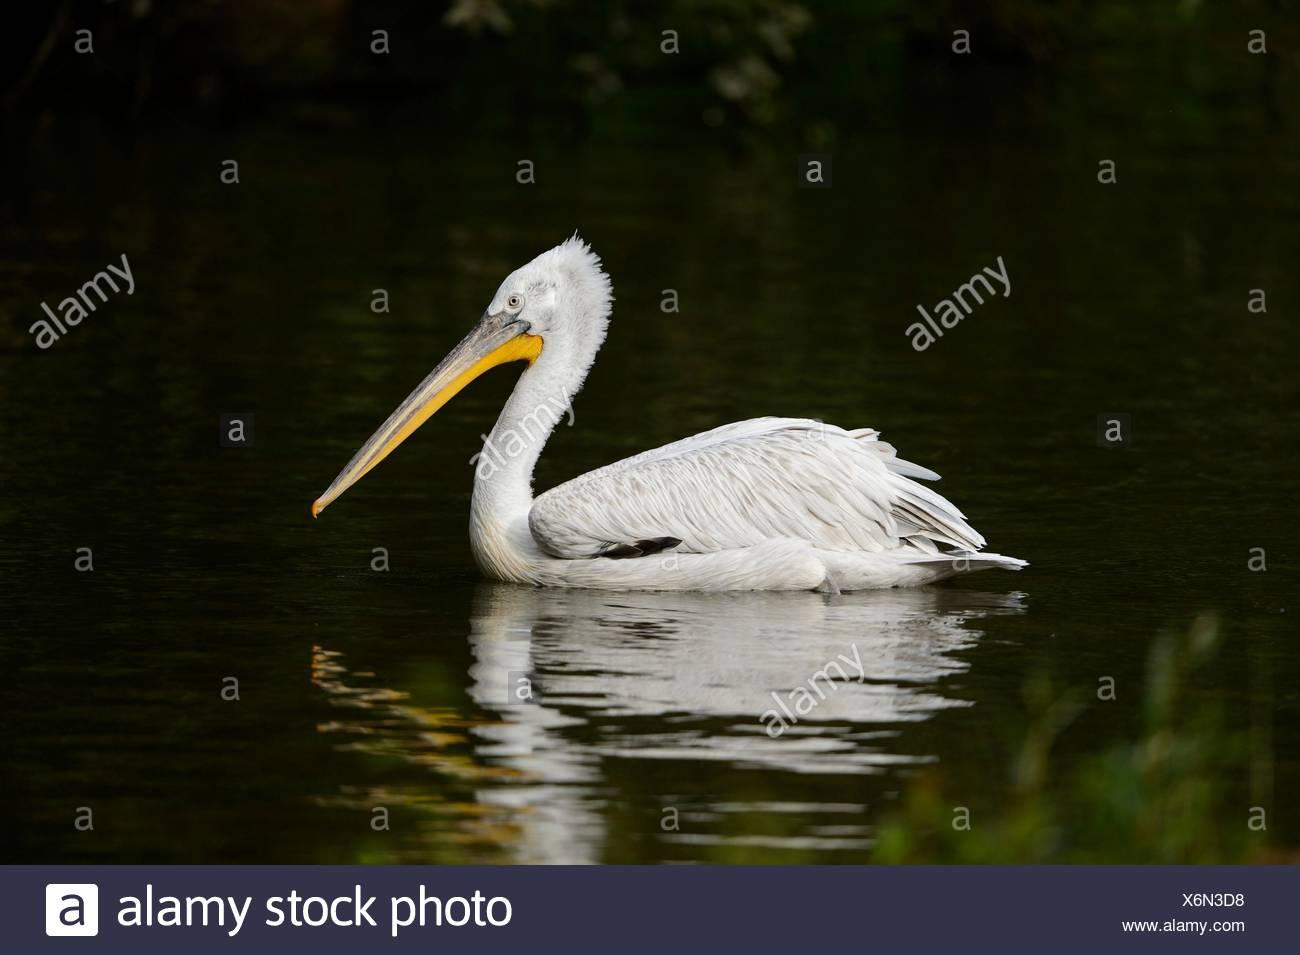 Dalmatian pelican swimming on a lake - Stock Image